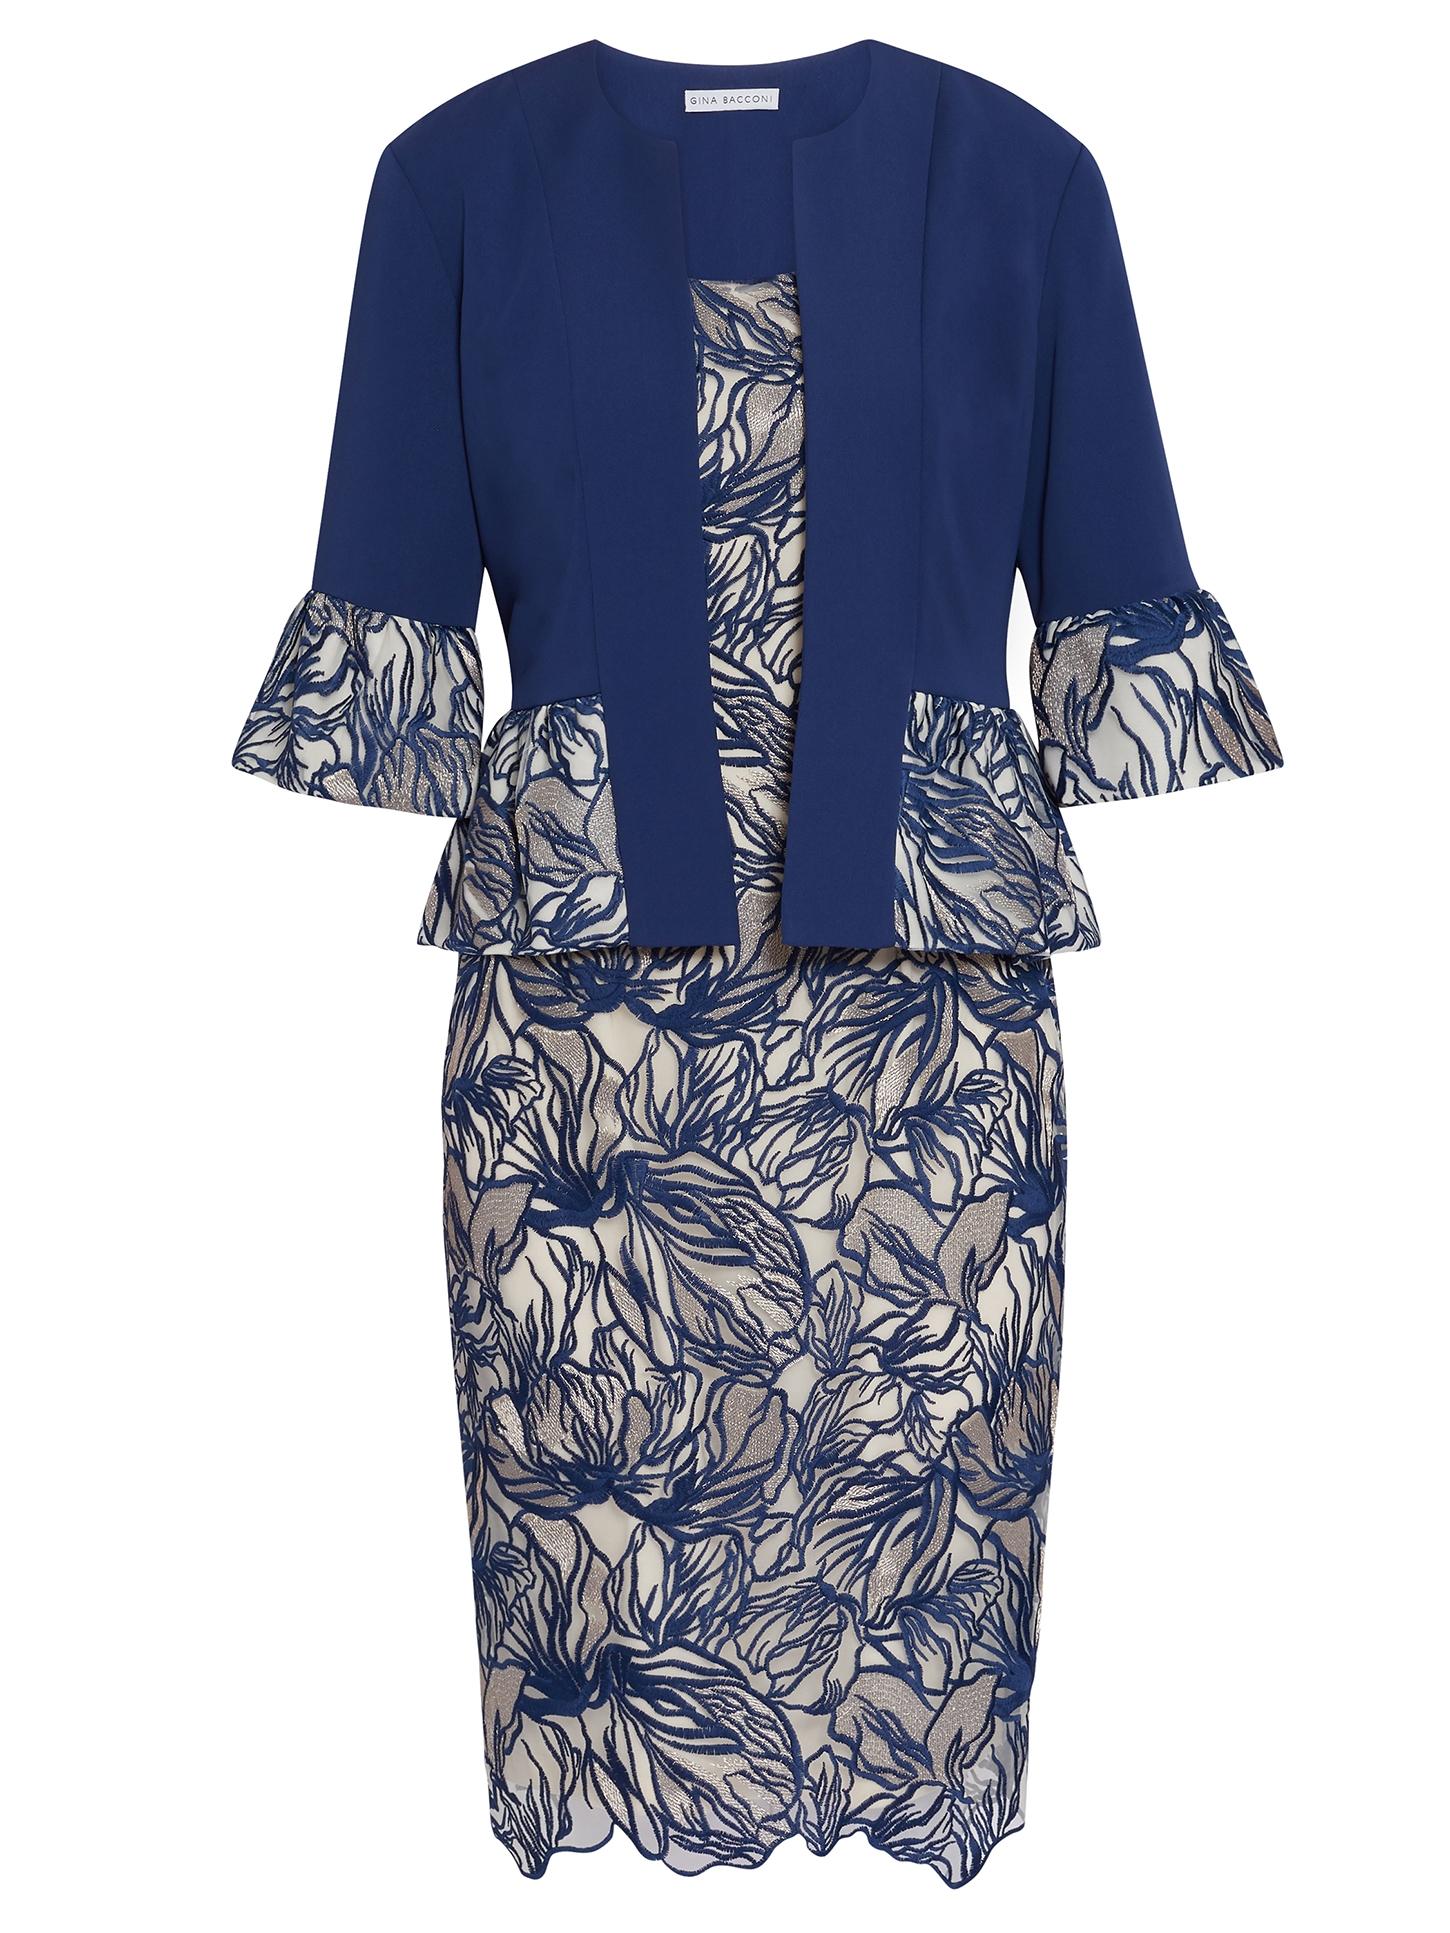 Trish Jacket And Dress